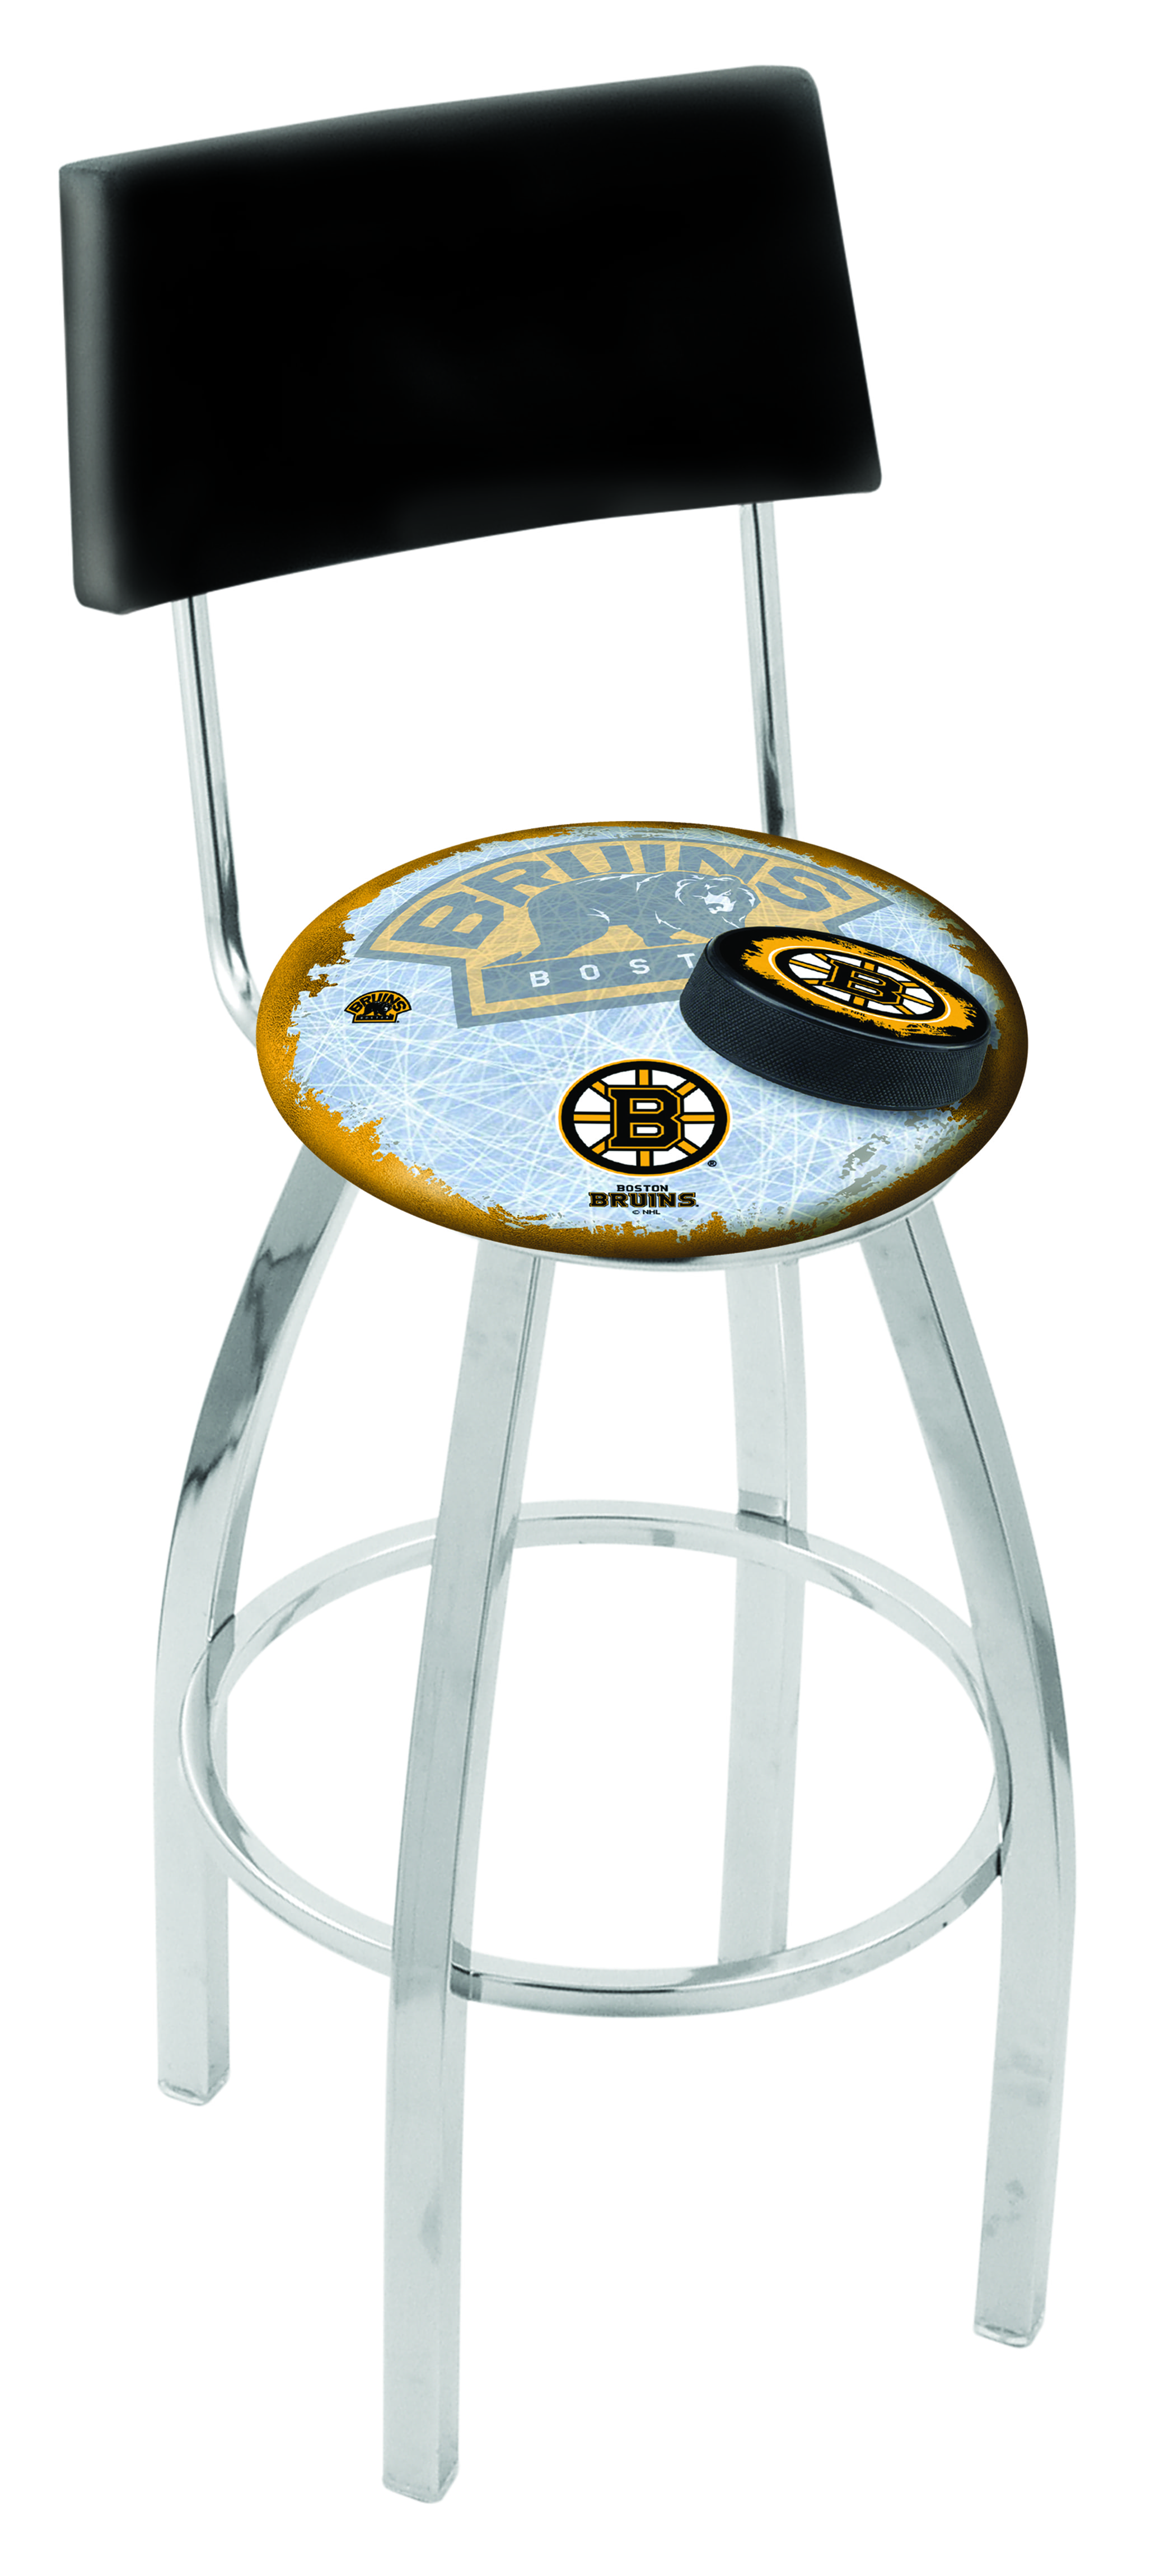 Boston Bruins Bar Stool W Official Nhl Logo Family Leisure